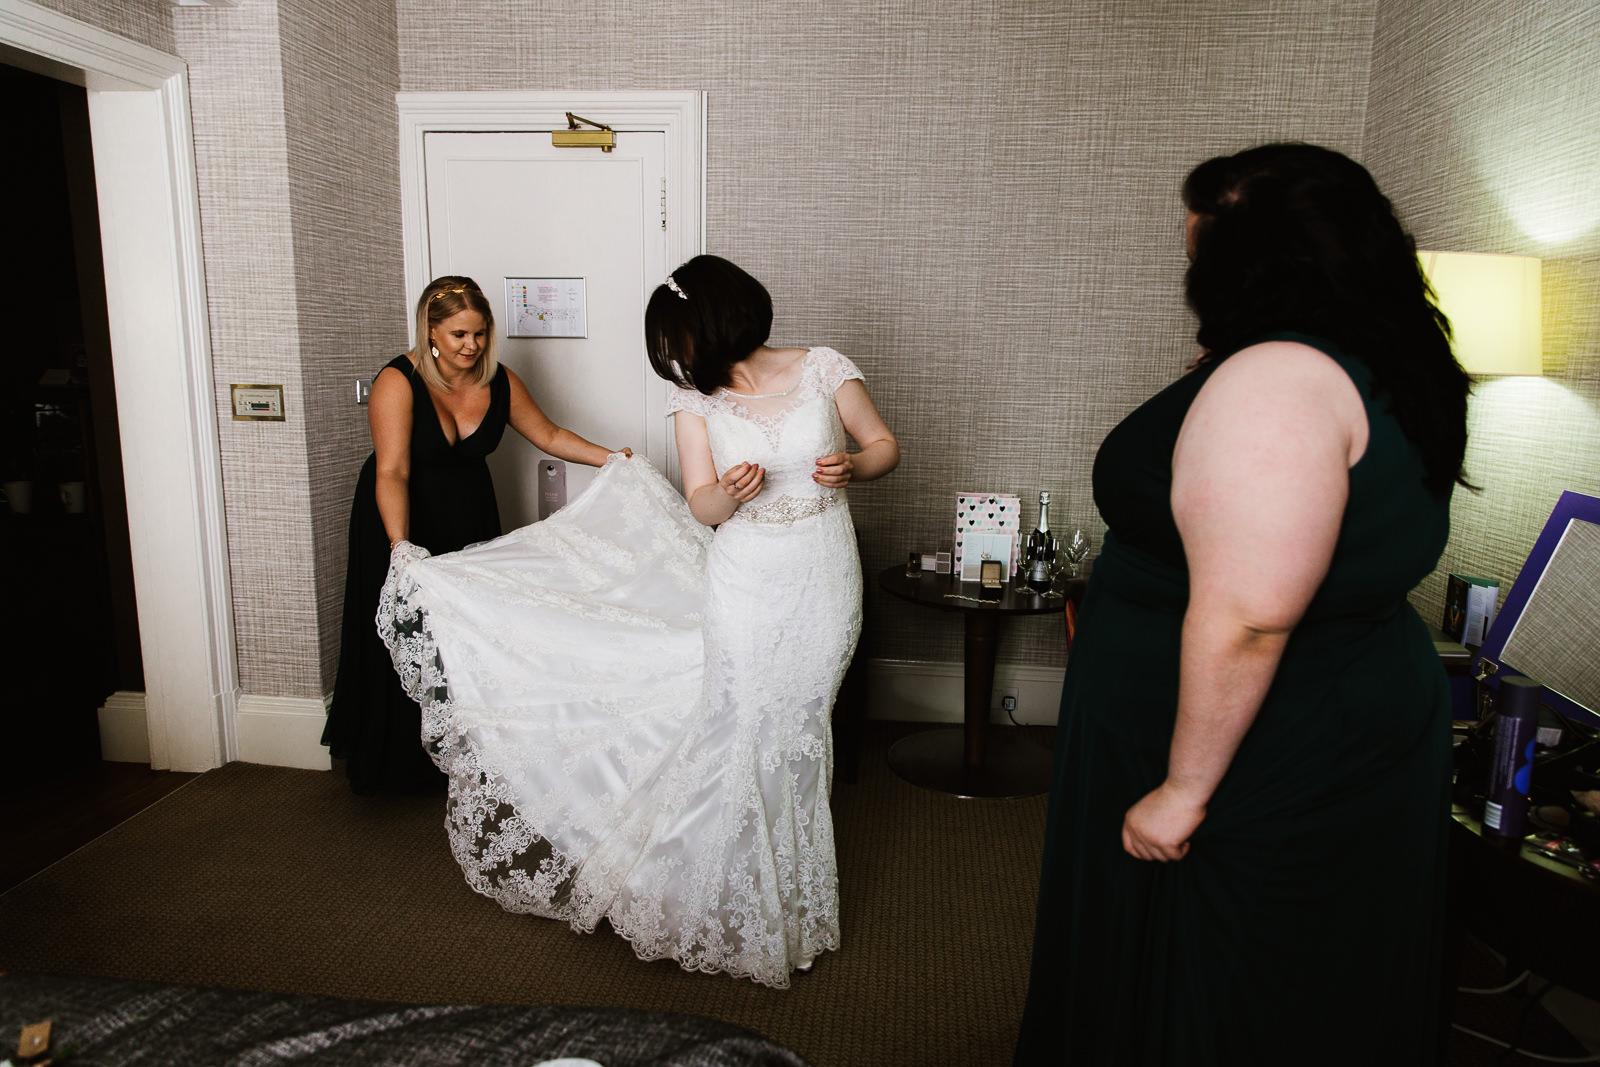 Bridesmaid holding wedding dress.